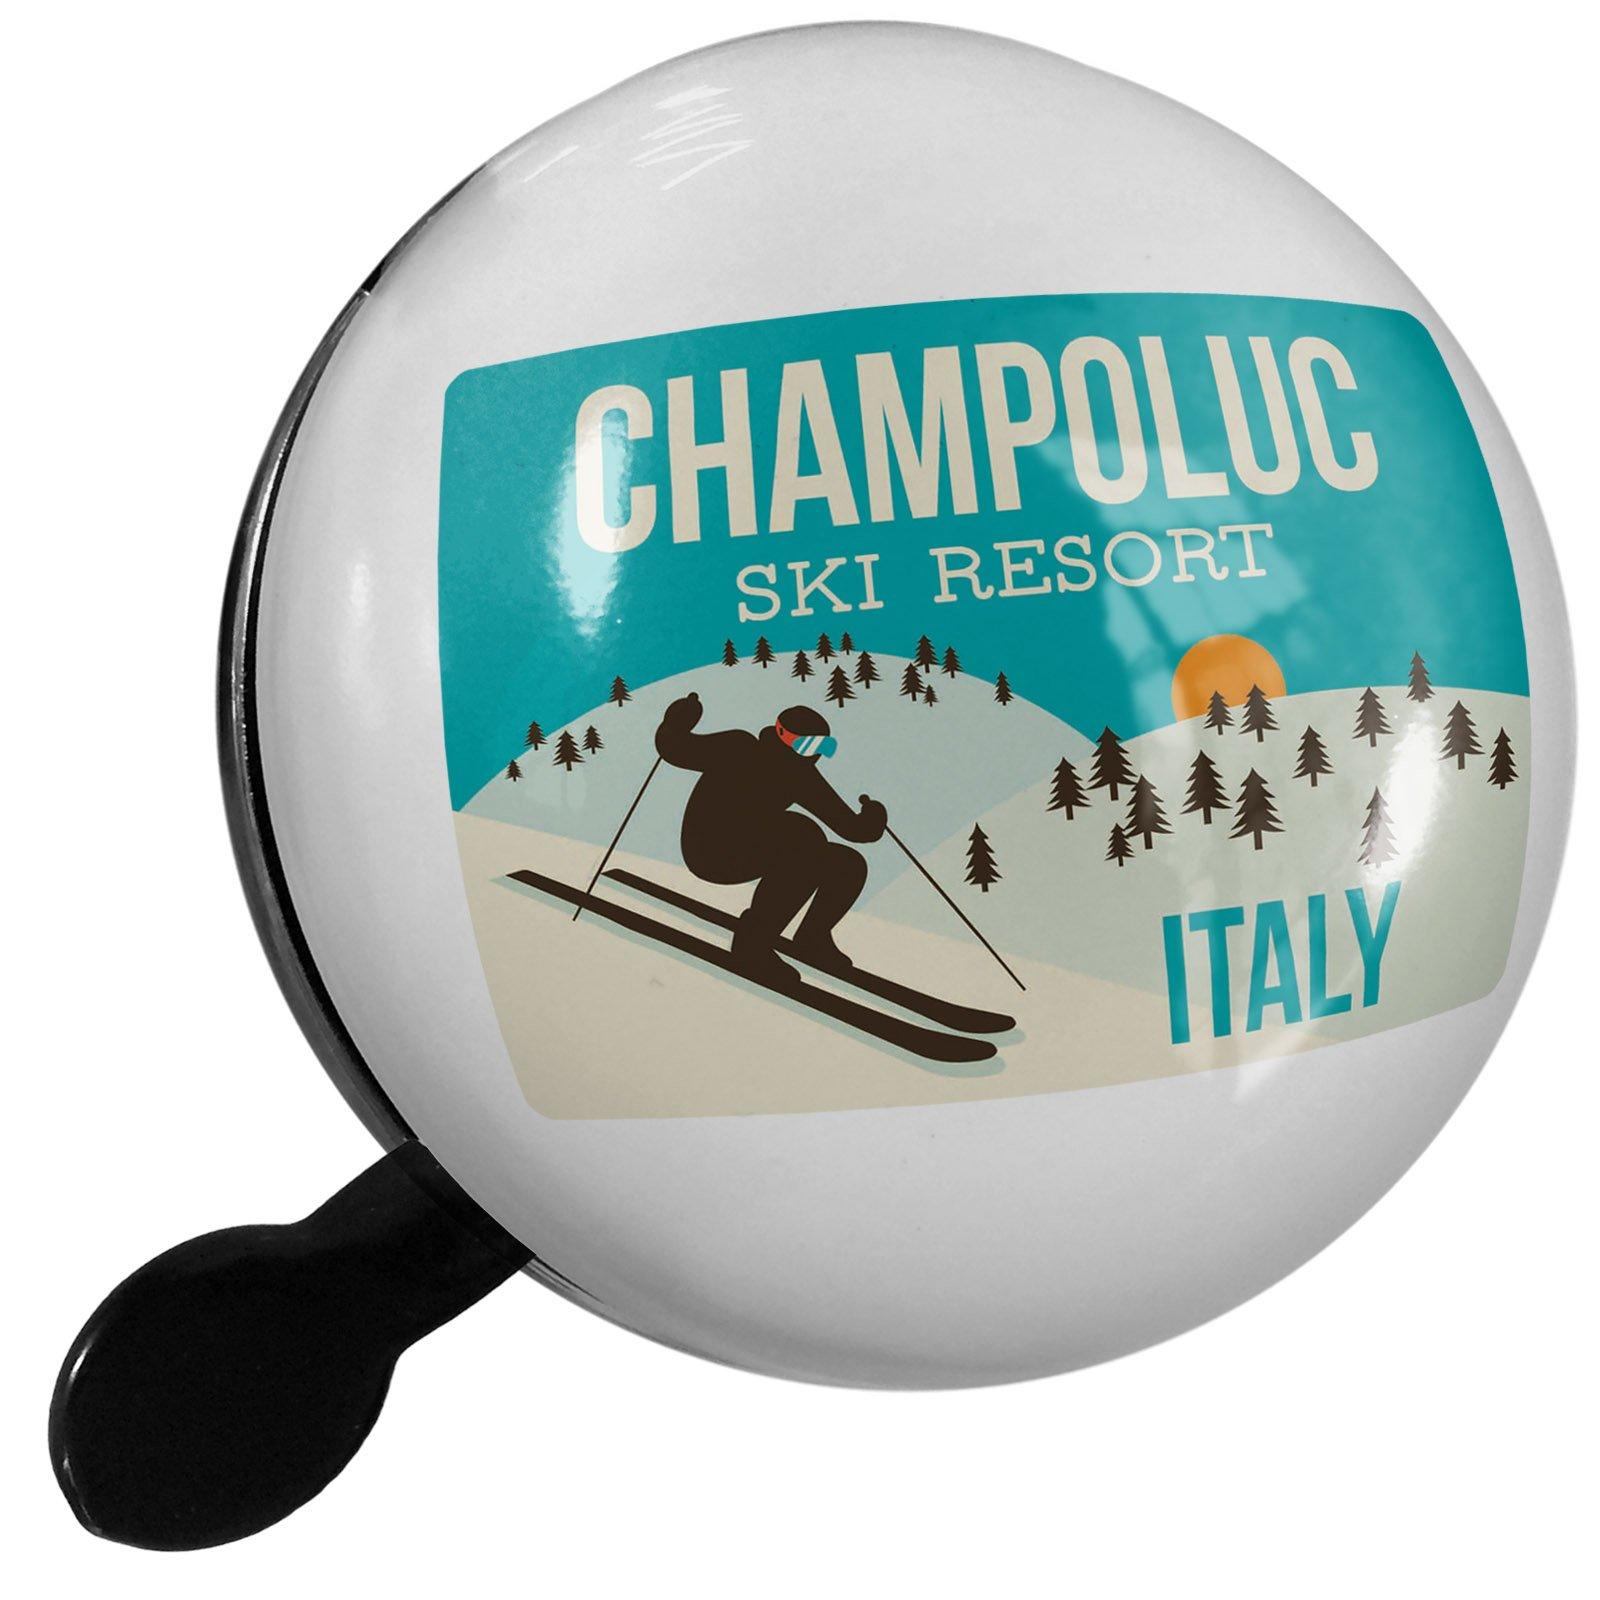 Small Bike Bell Champoluc Ski Resort - Italy Ski Resort - NEONBLOND